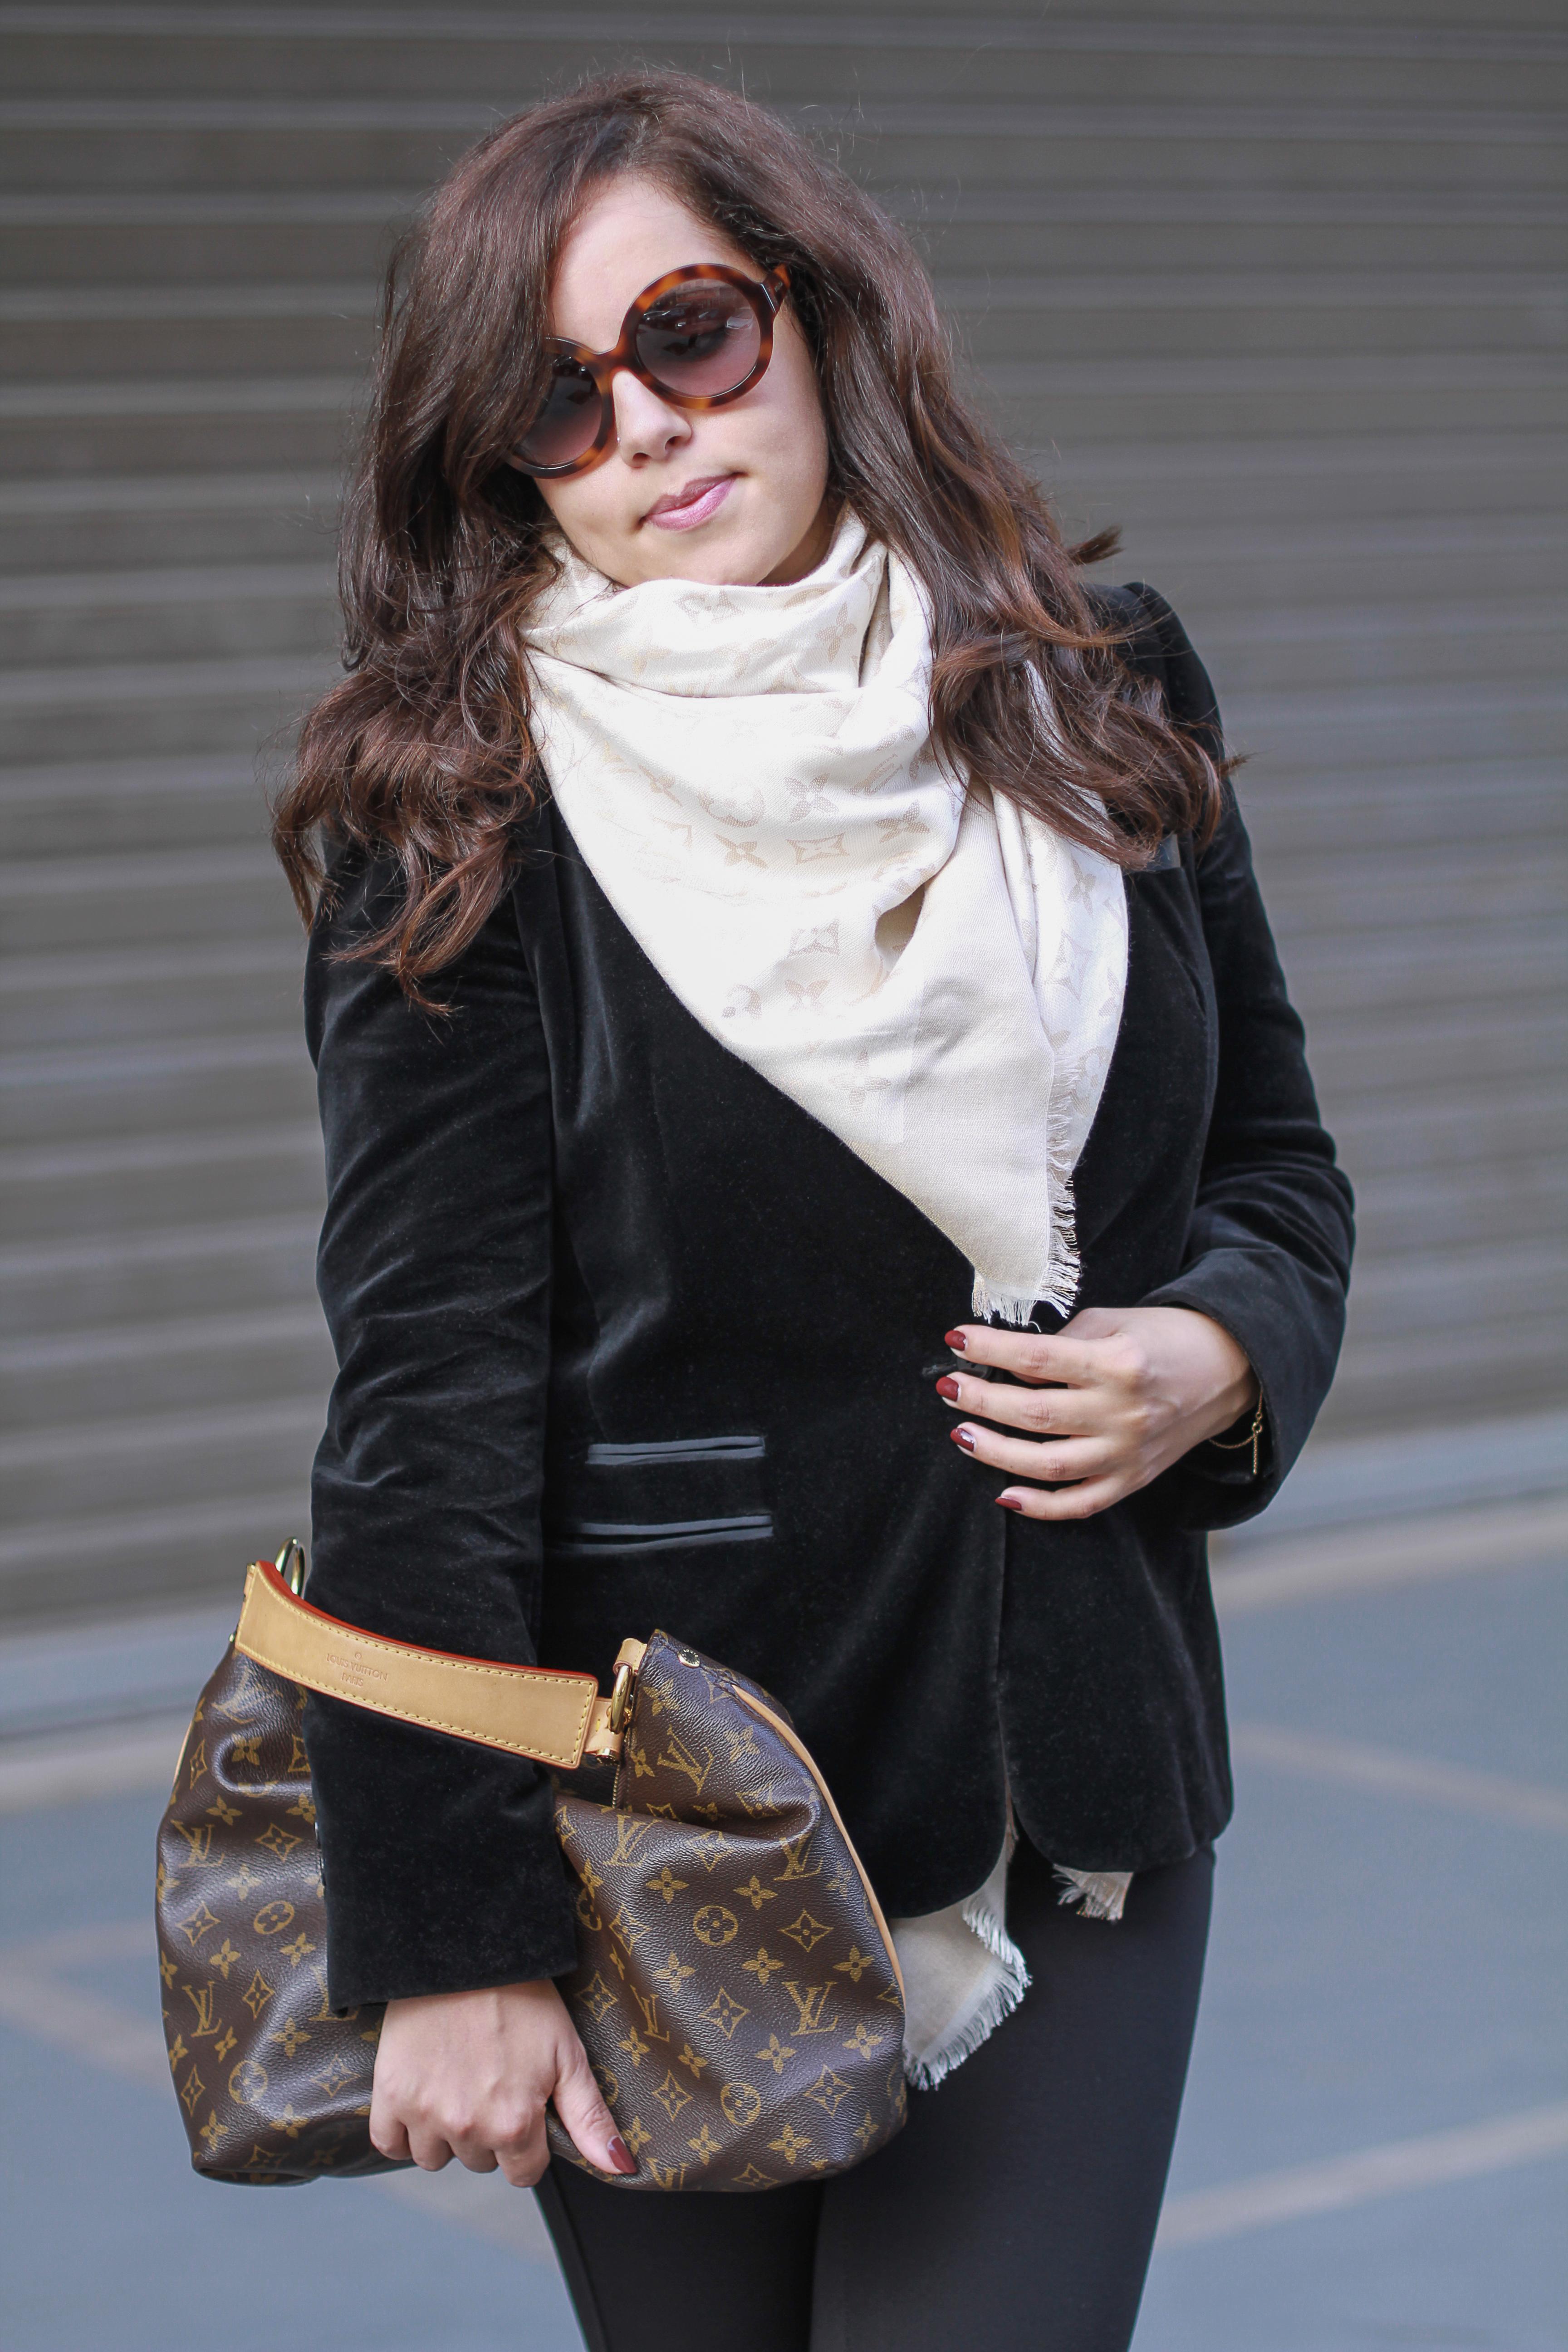 le-total-look-noir-blog-mode-chiccarpediem-6